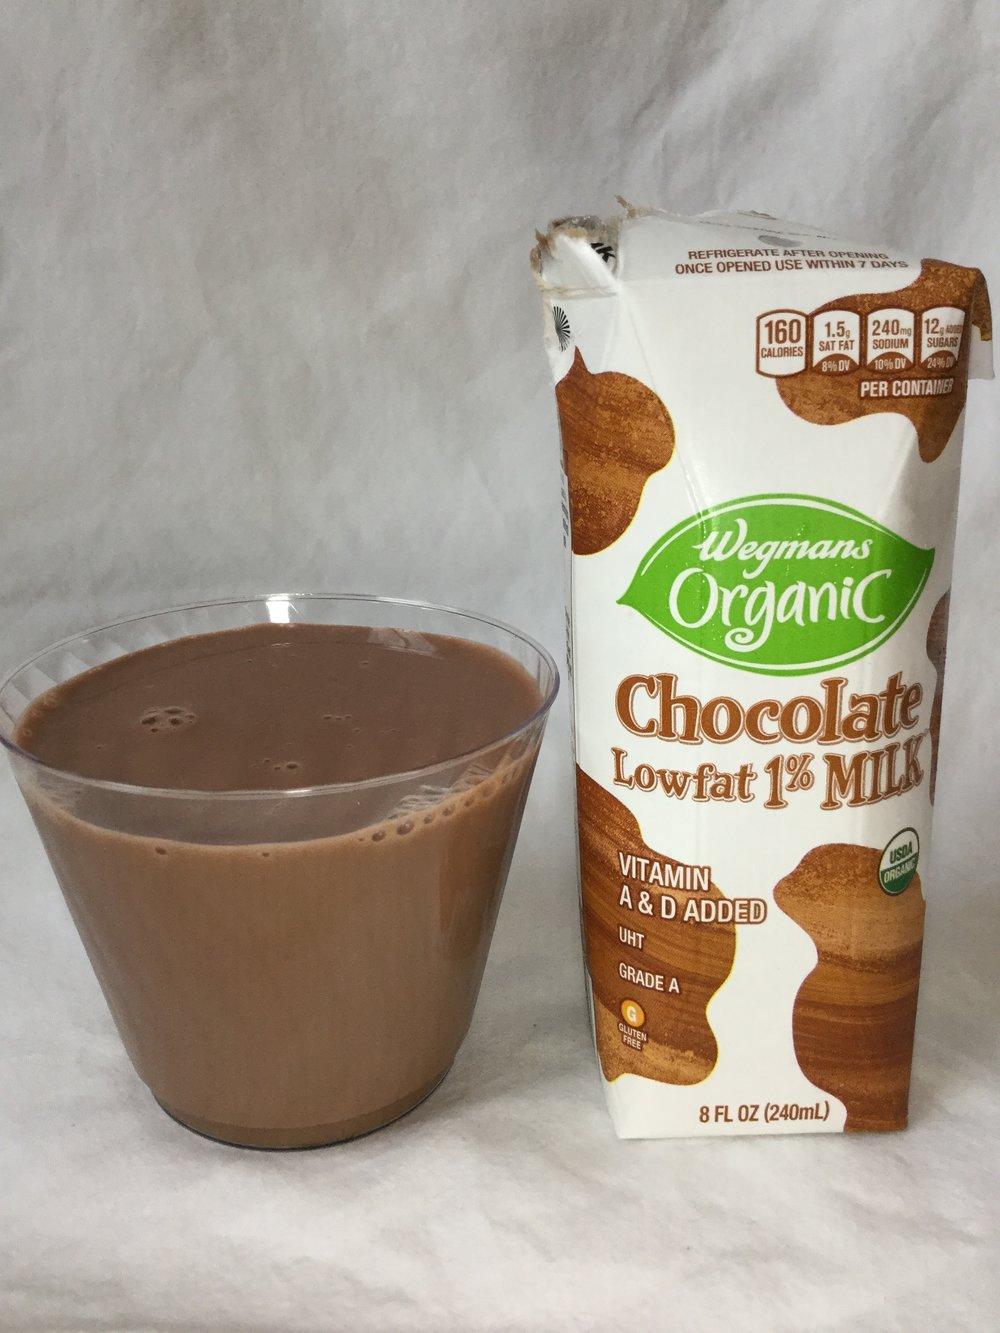 Wegmans Organic Lowfat Chocolate Milk Cup